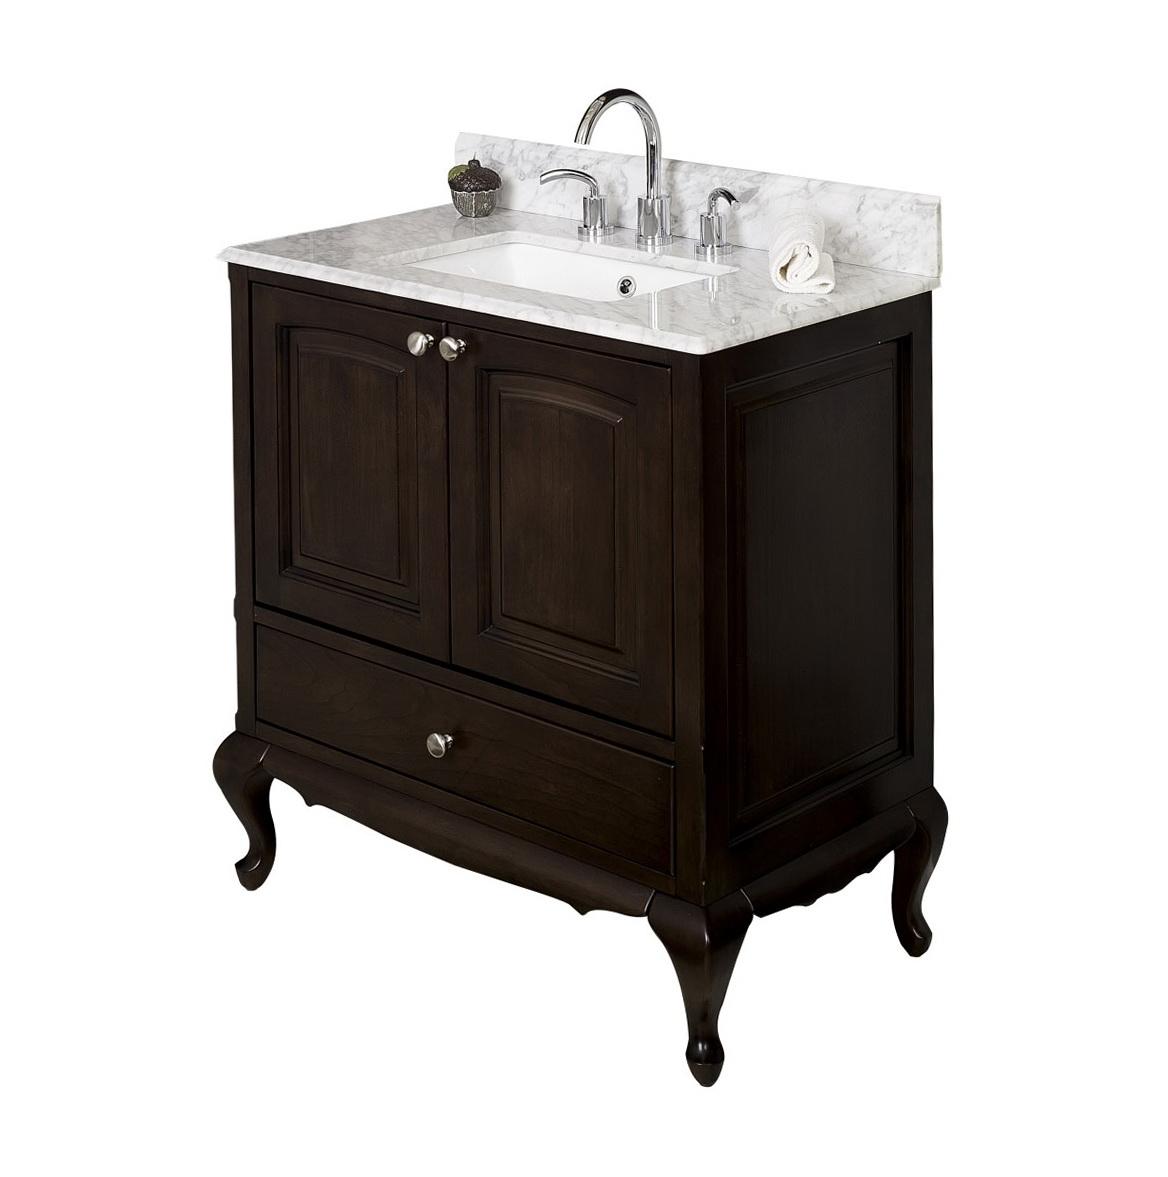 32 Inch Bathroom Vanity Lowes Home Design Ideas